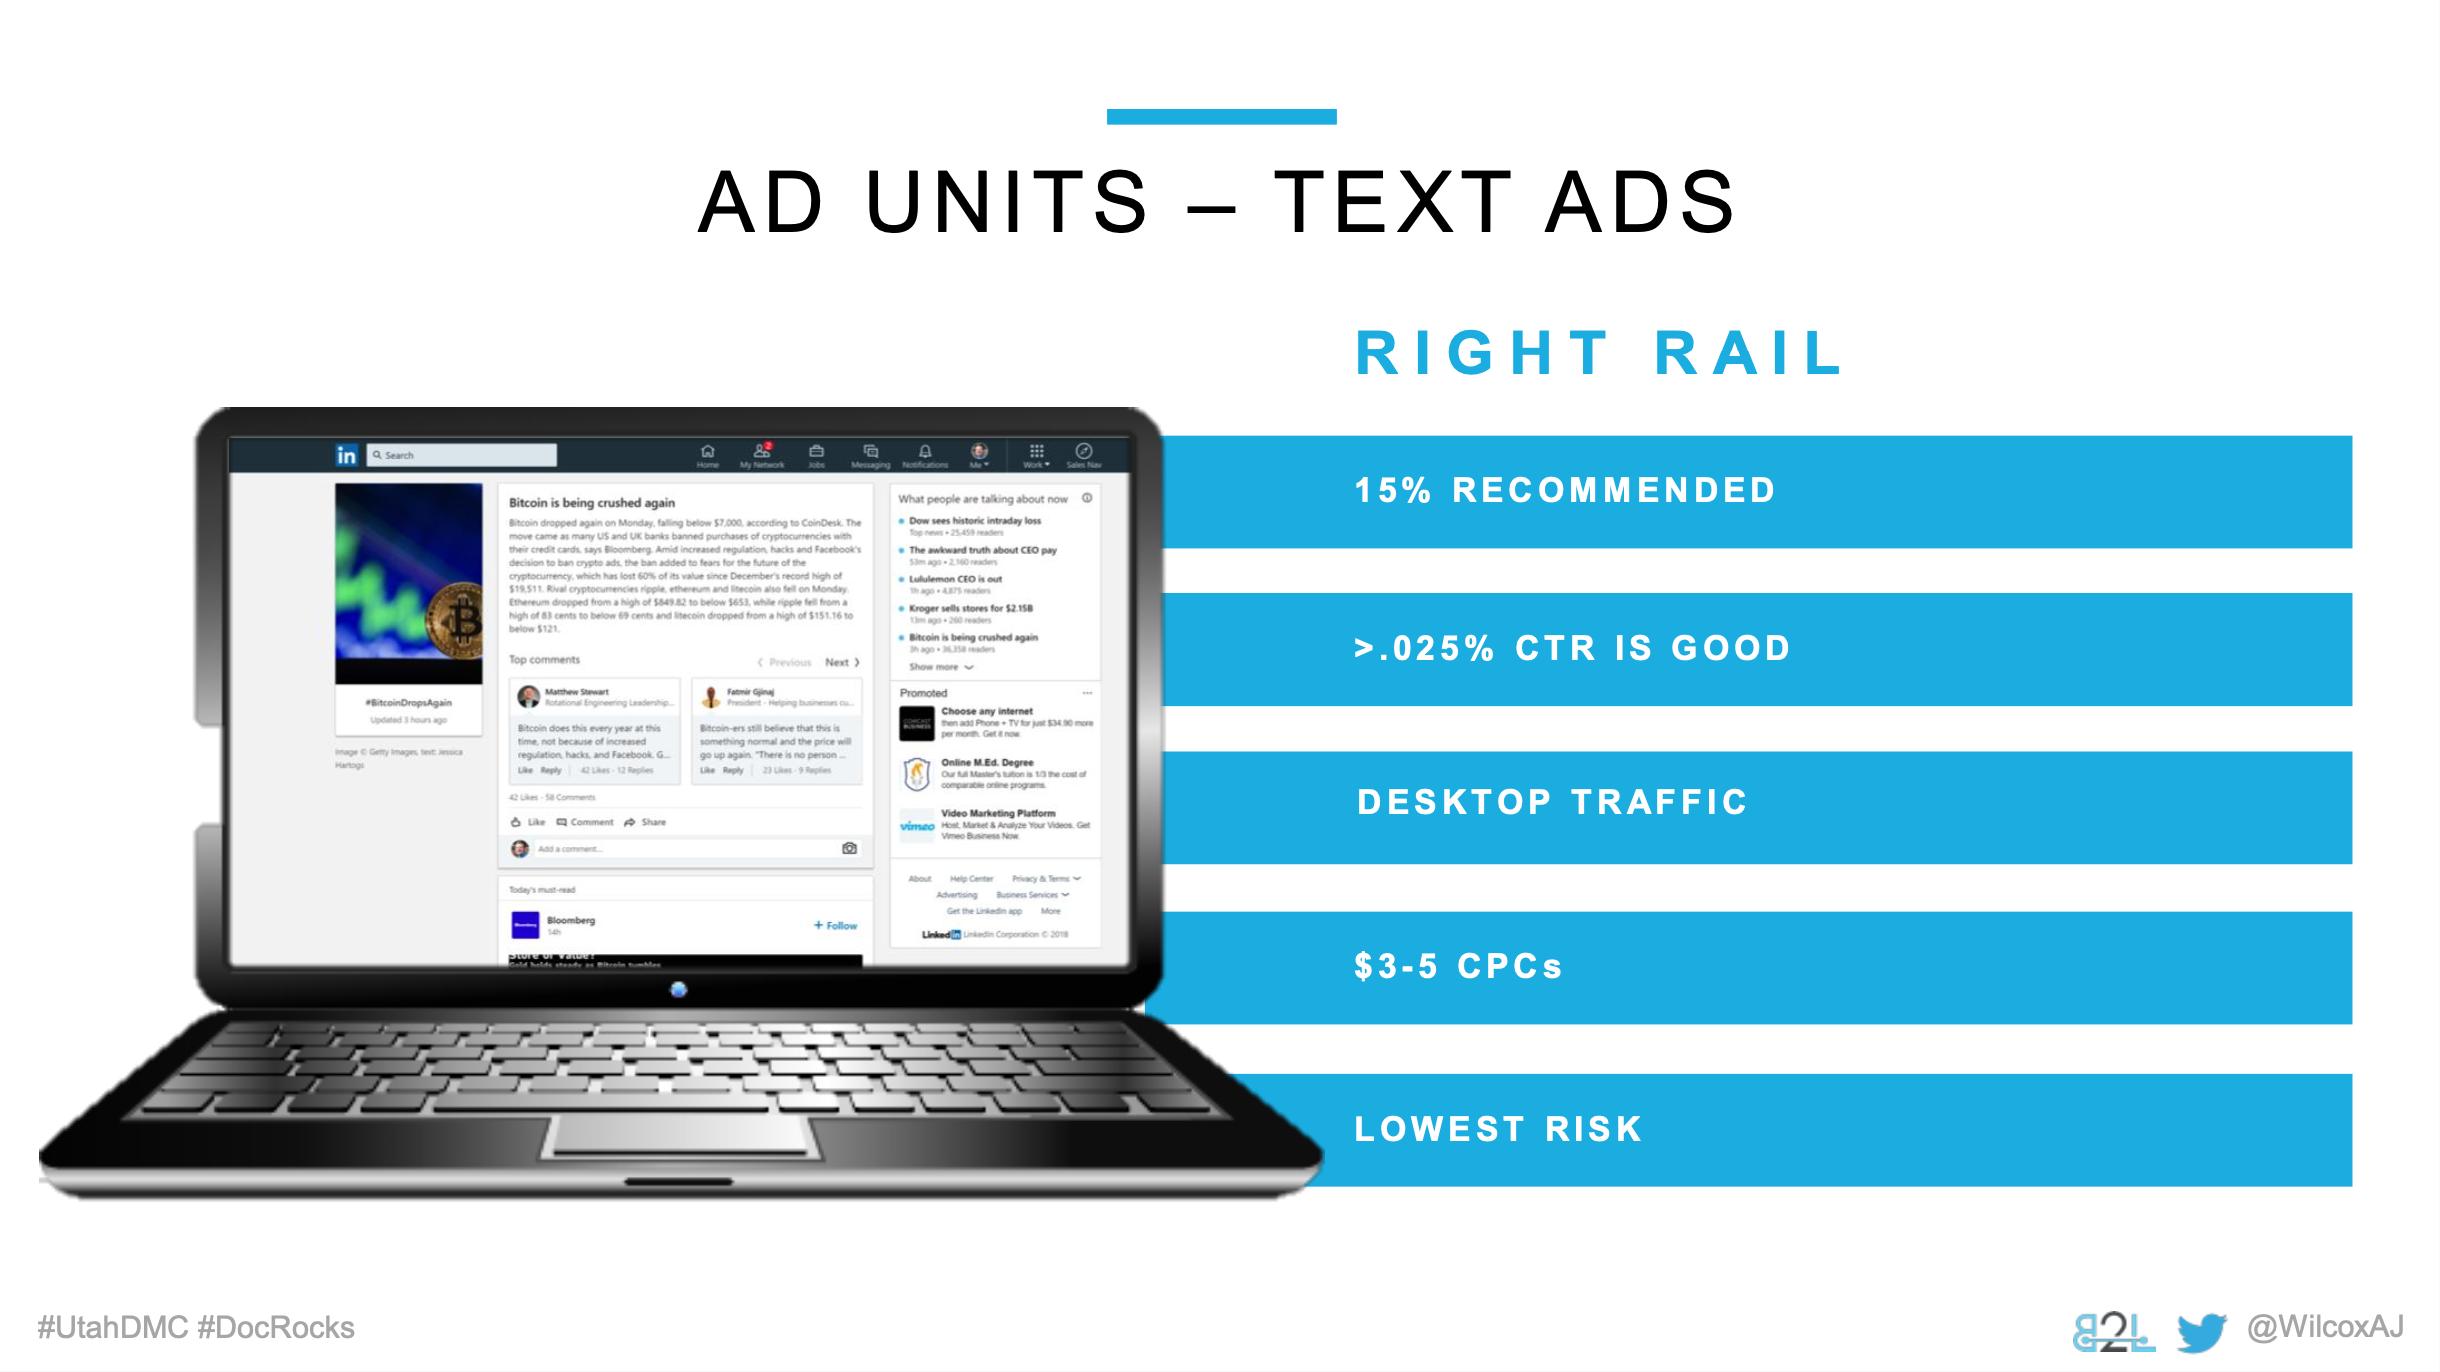 Utah DMC LinkedIn Ads - Aj Wilcox - Ad Units - Text Ads